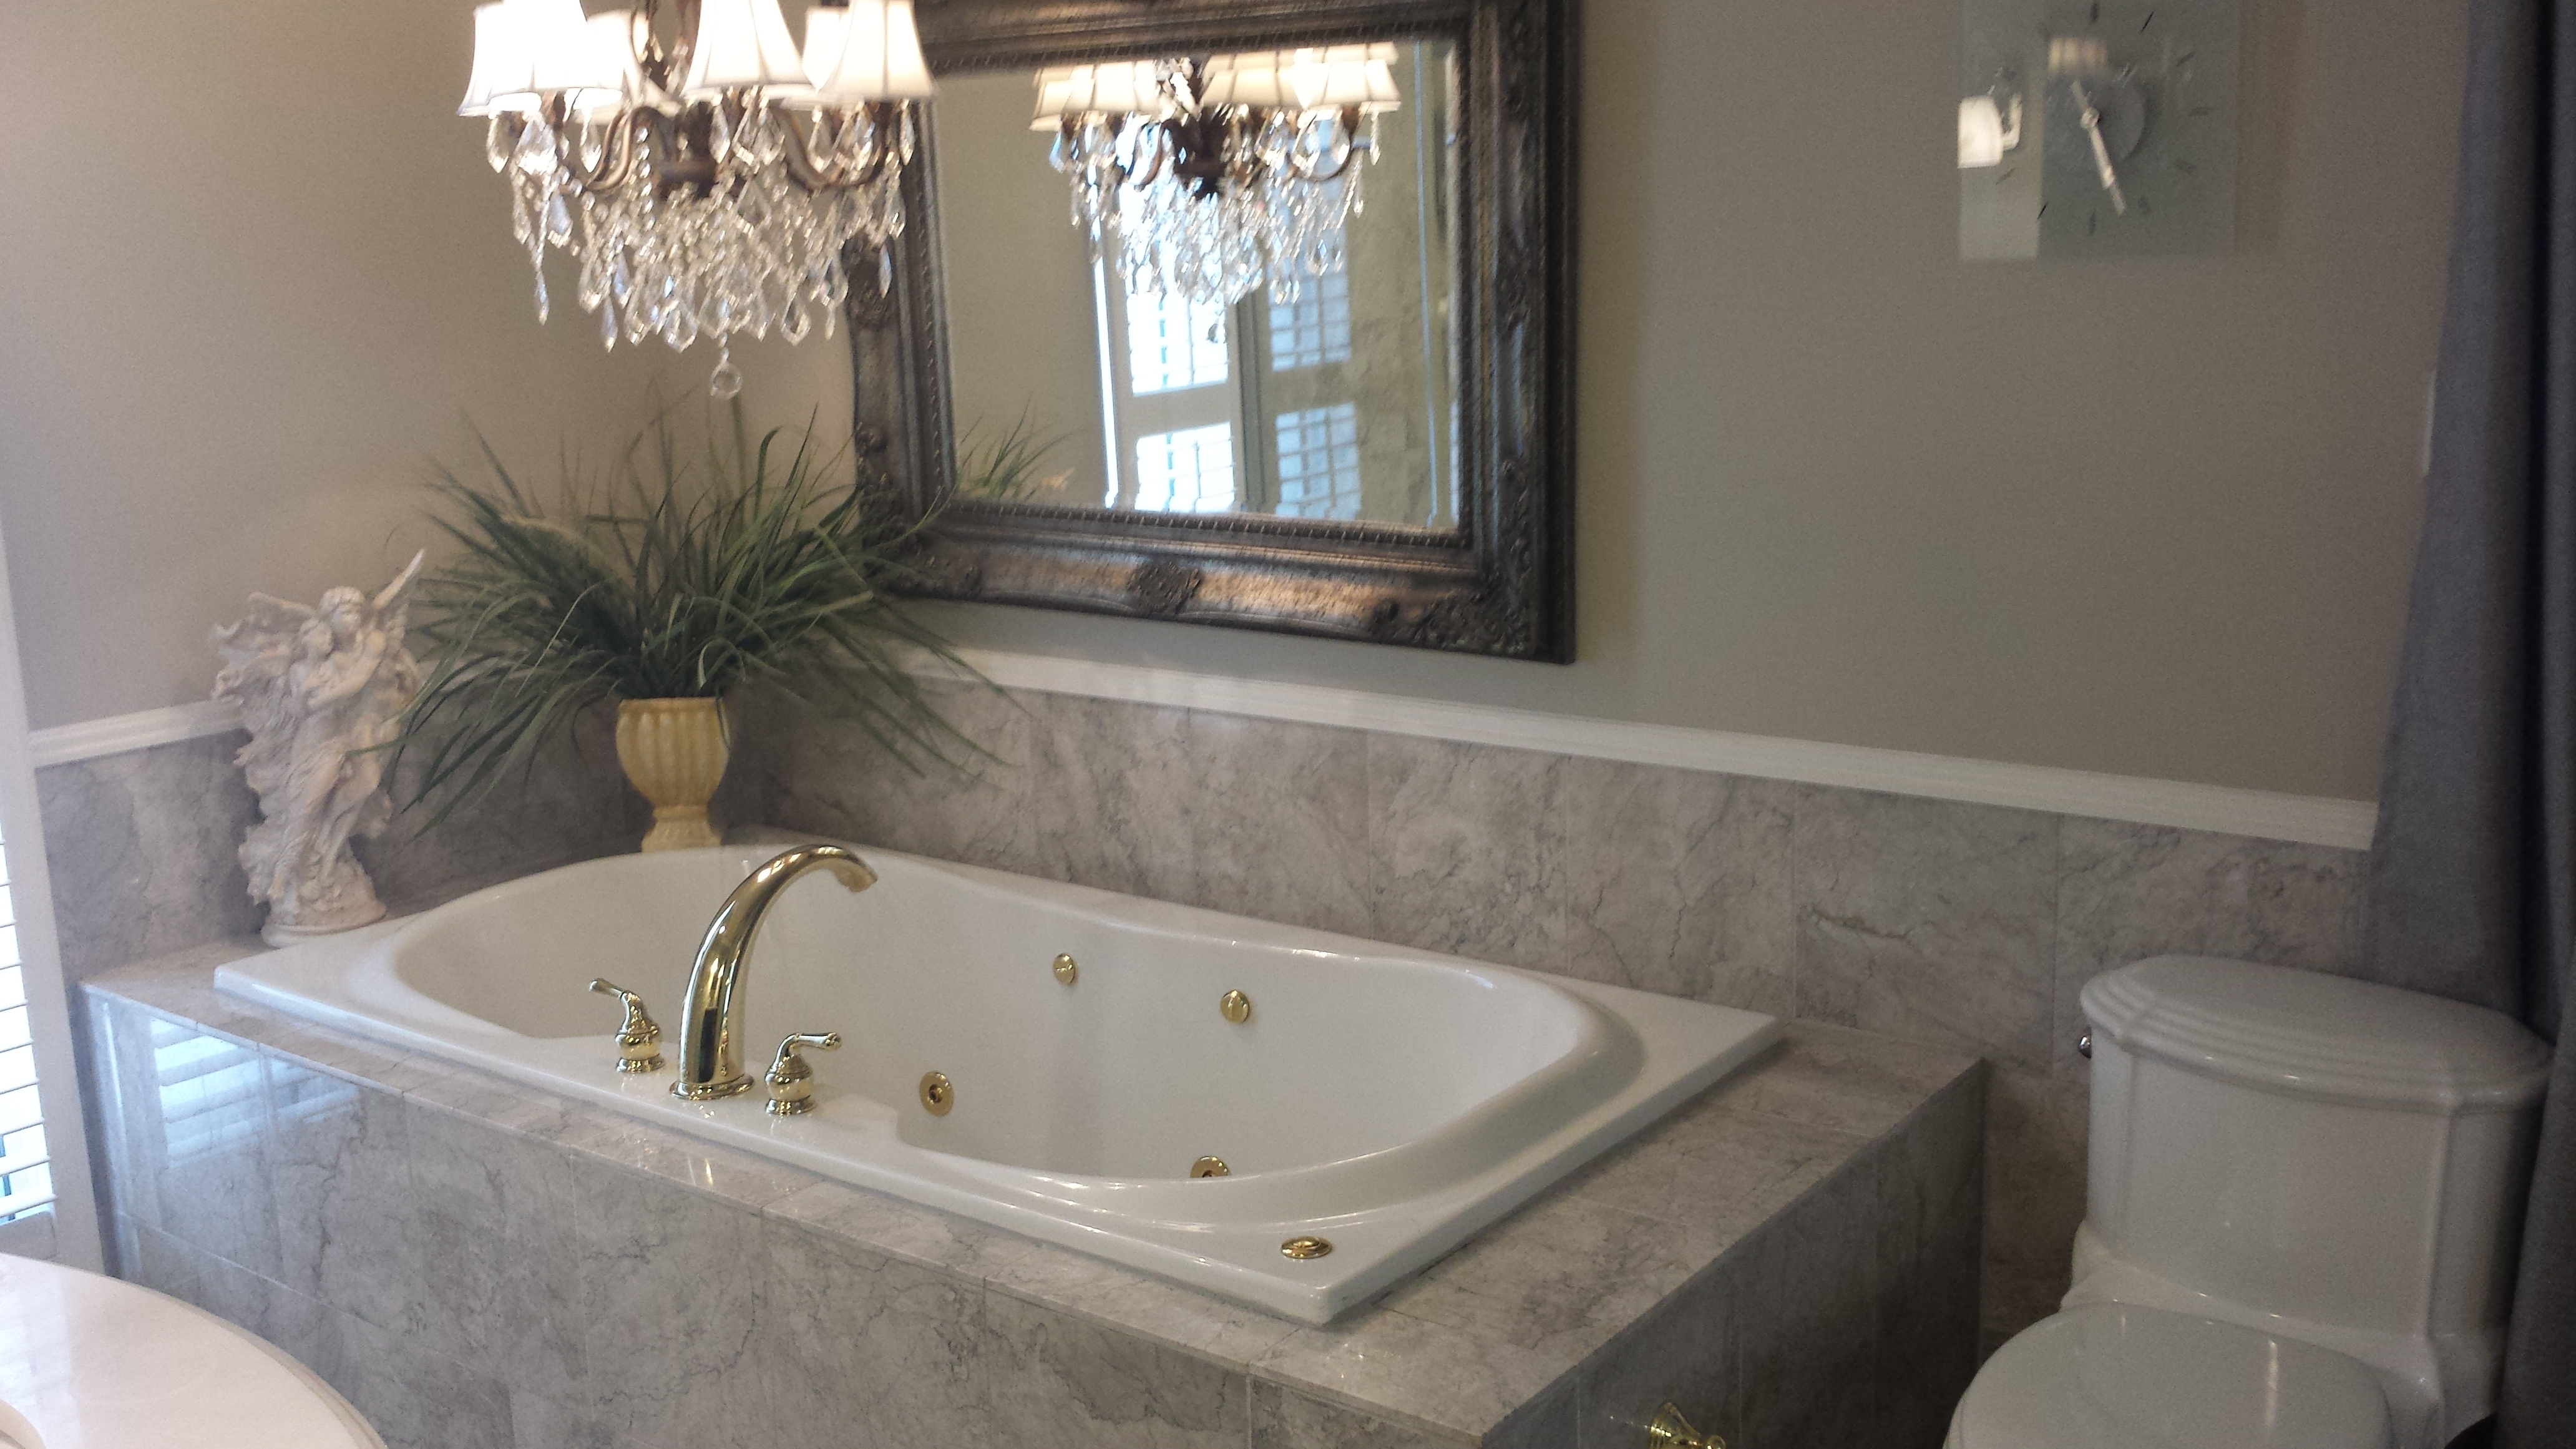 Bianca's Bath